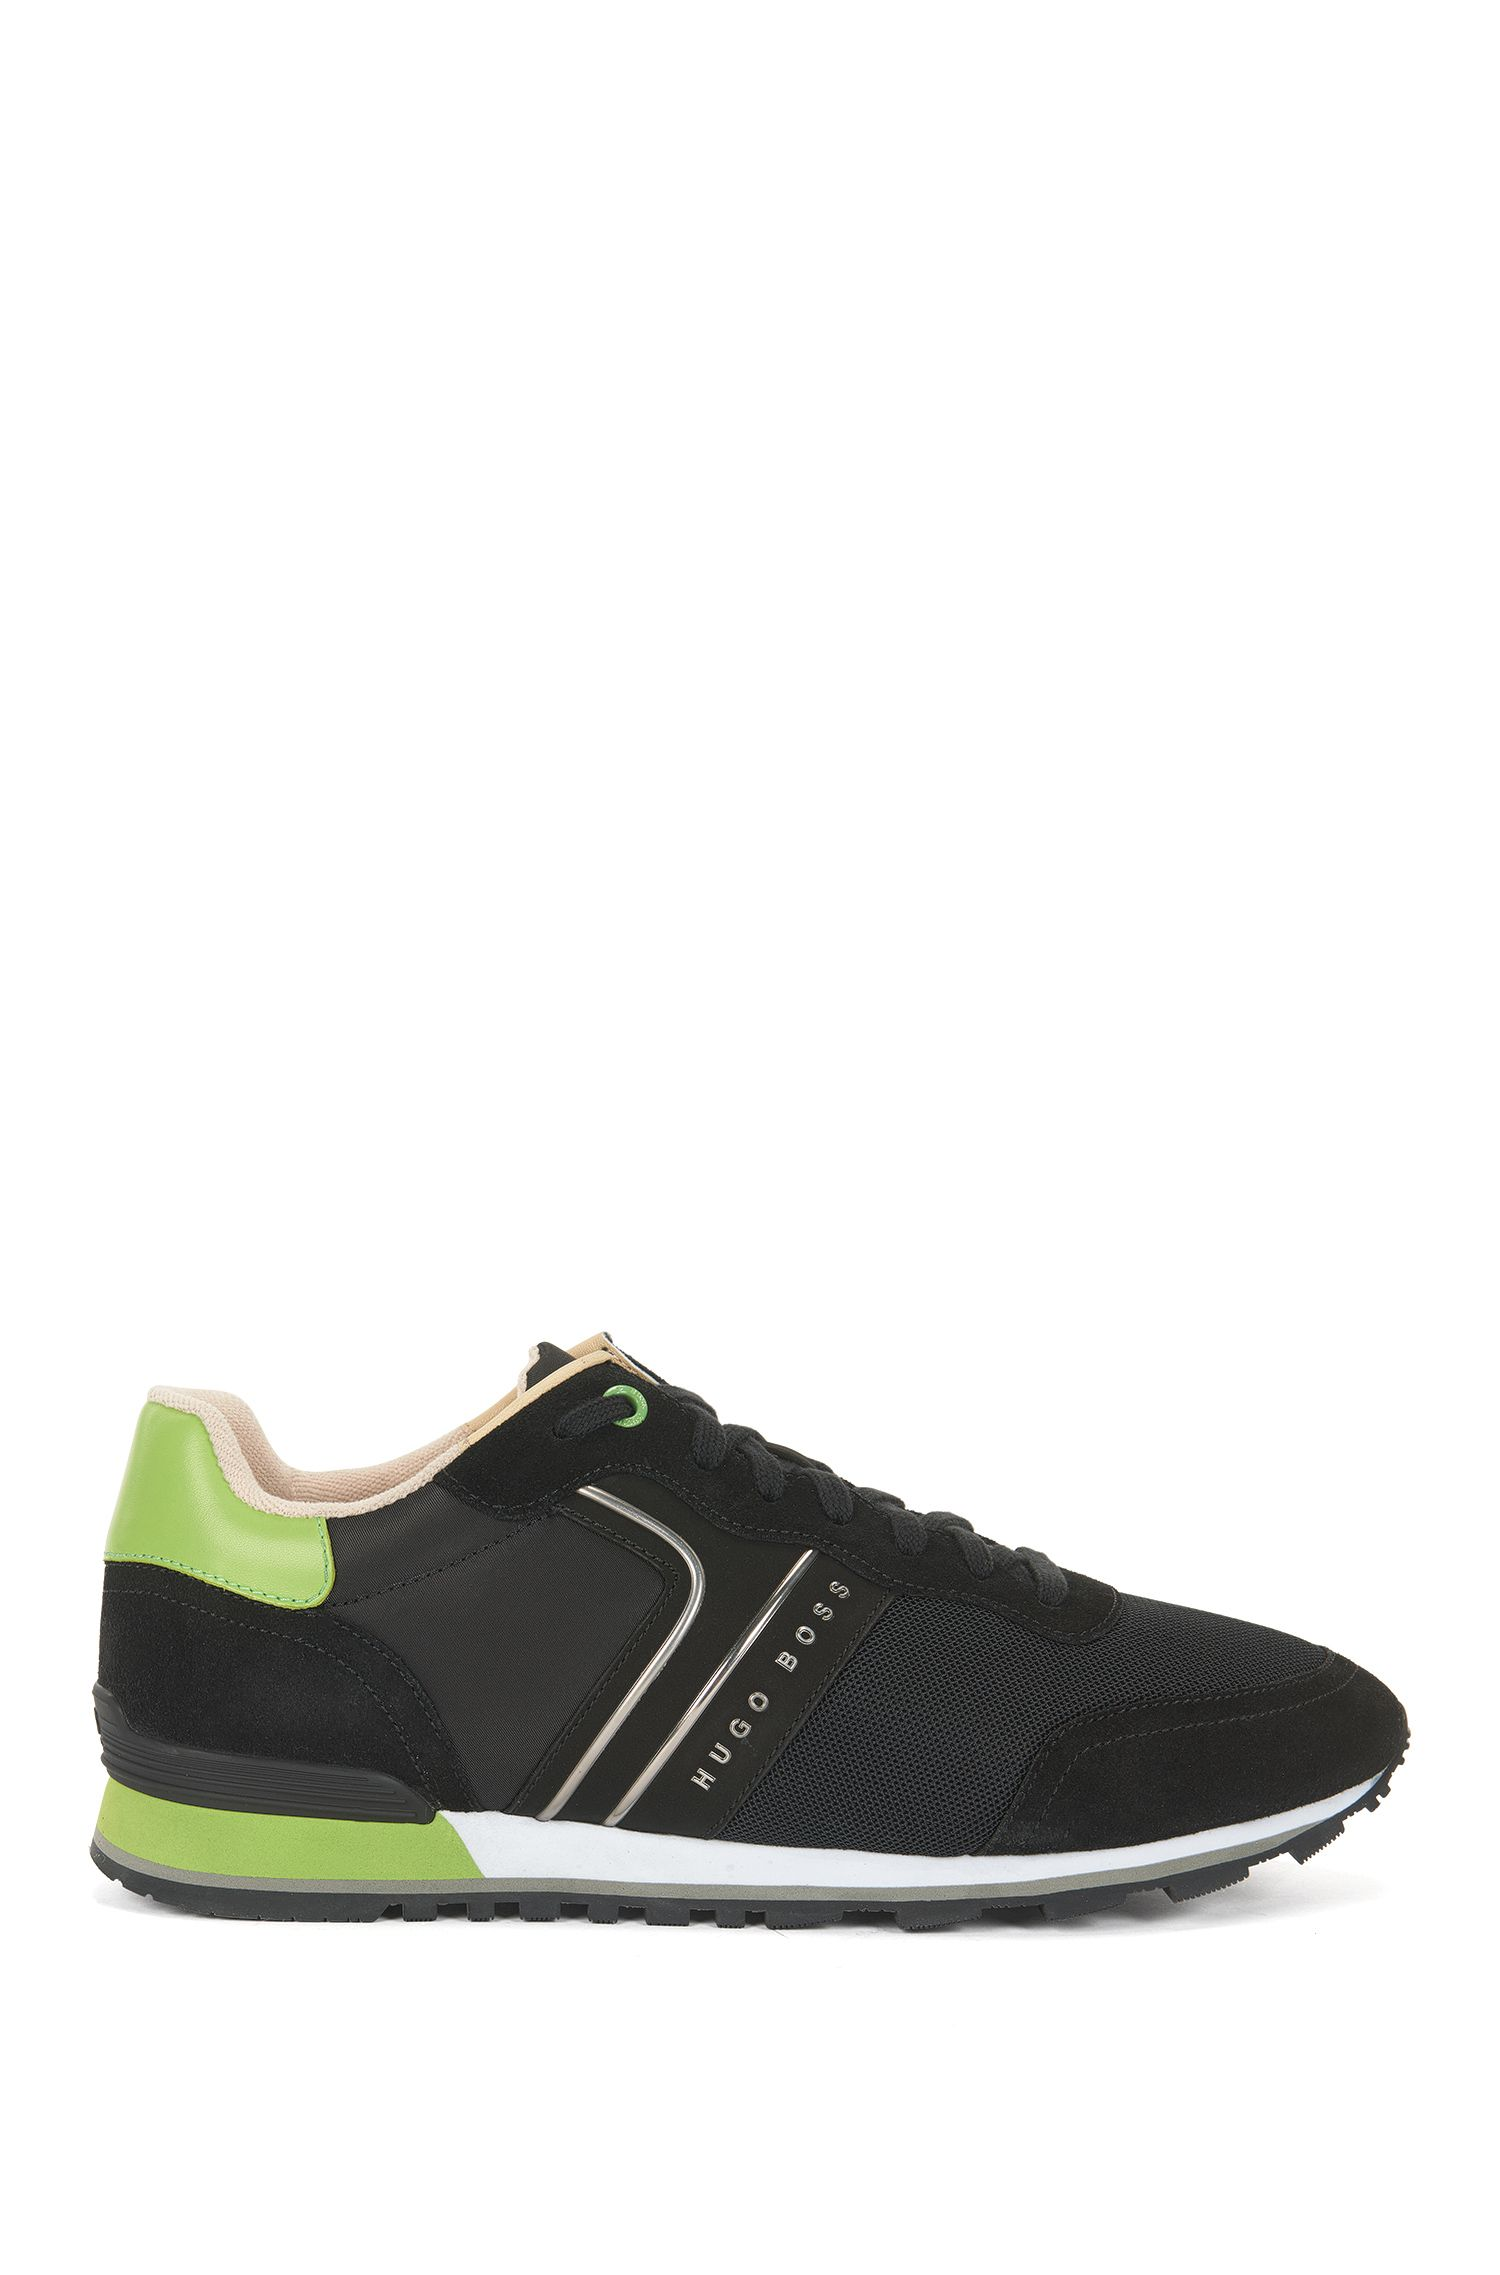 Sneakers leggere stringate in tessuto ibrido